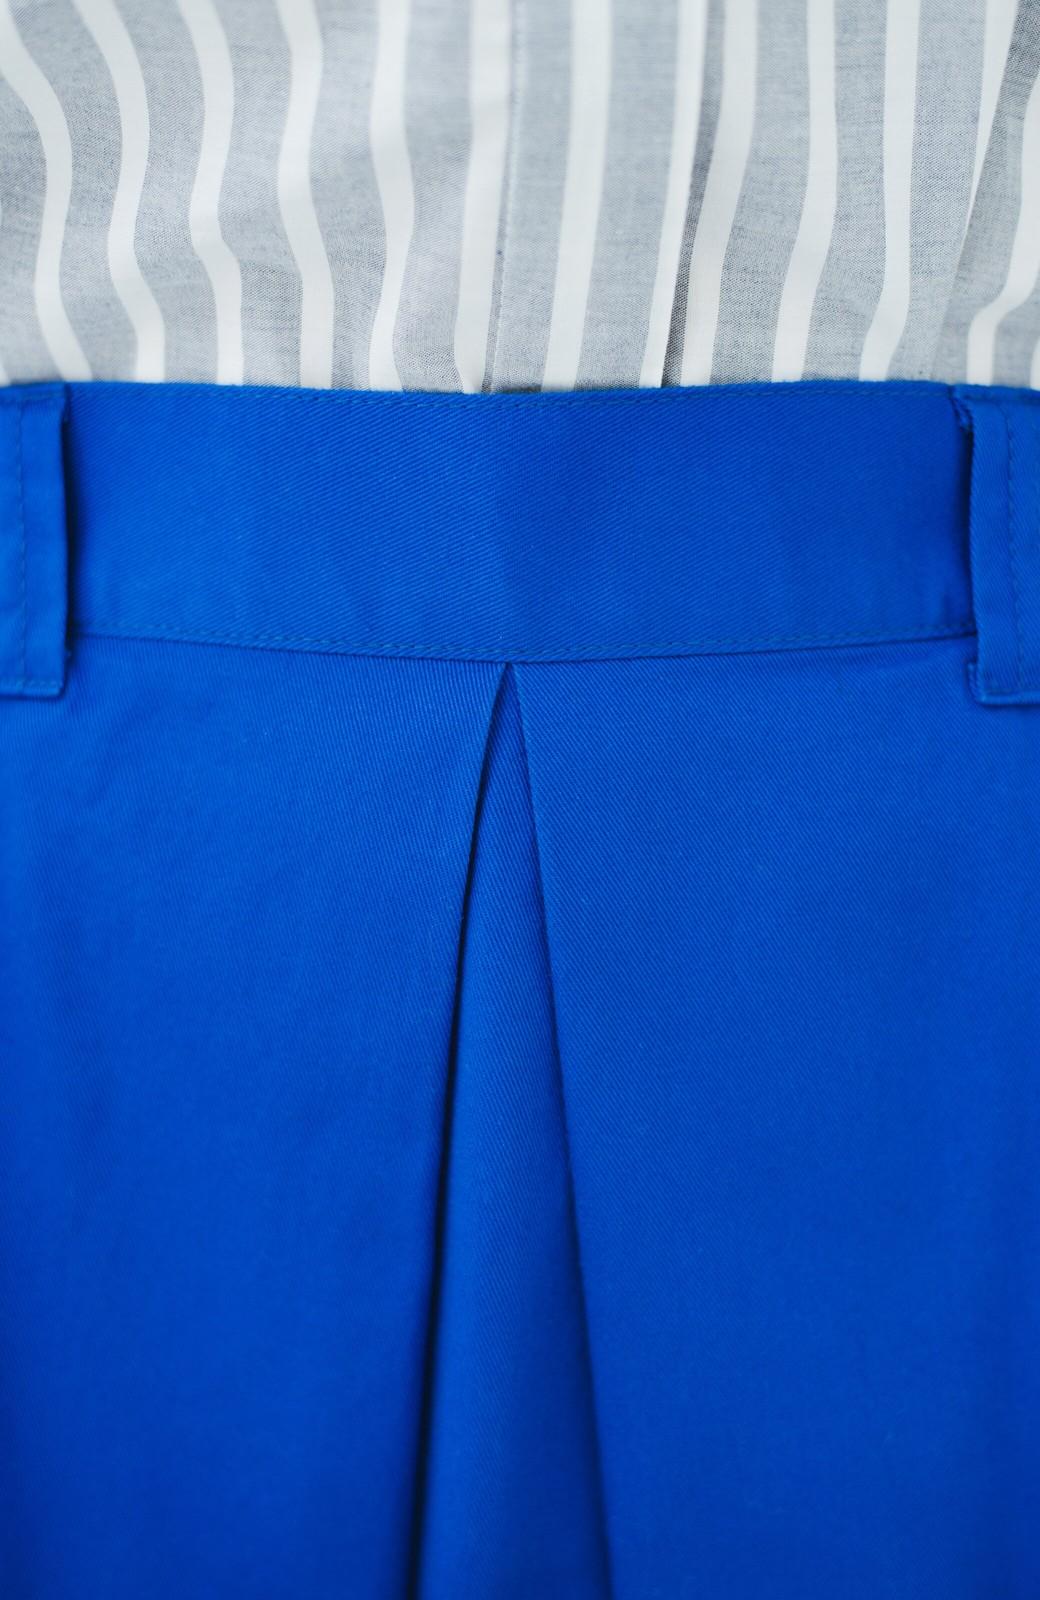 haco! 【今年も再販!】ロングシーズン楽しめる タックボリュームのチノロングスカート <ブルー>の商品写真8